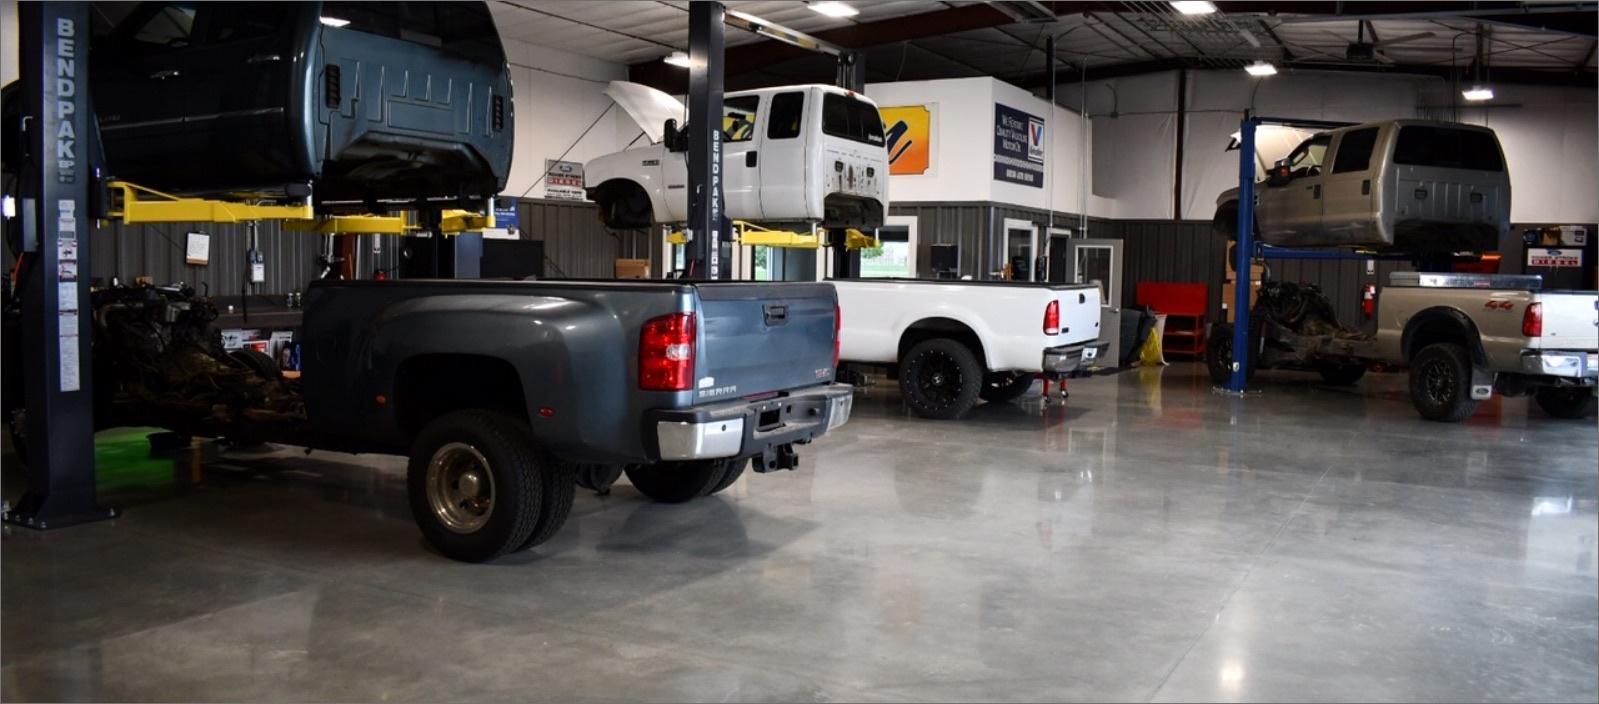 Full Service Diesel Repair facility Nassau/Suffolk Co